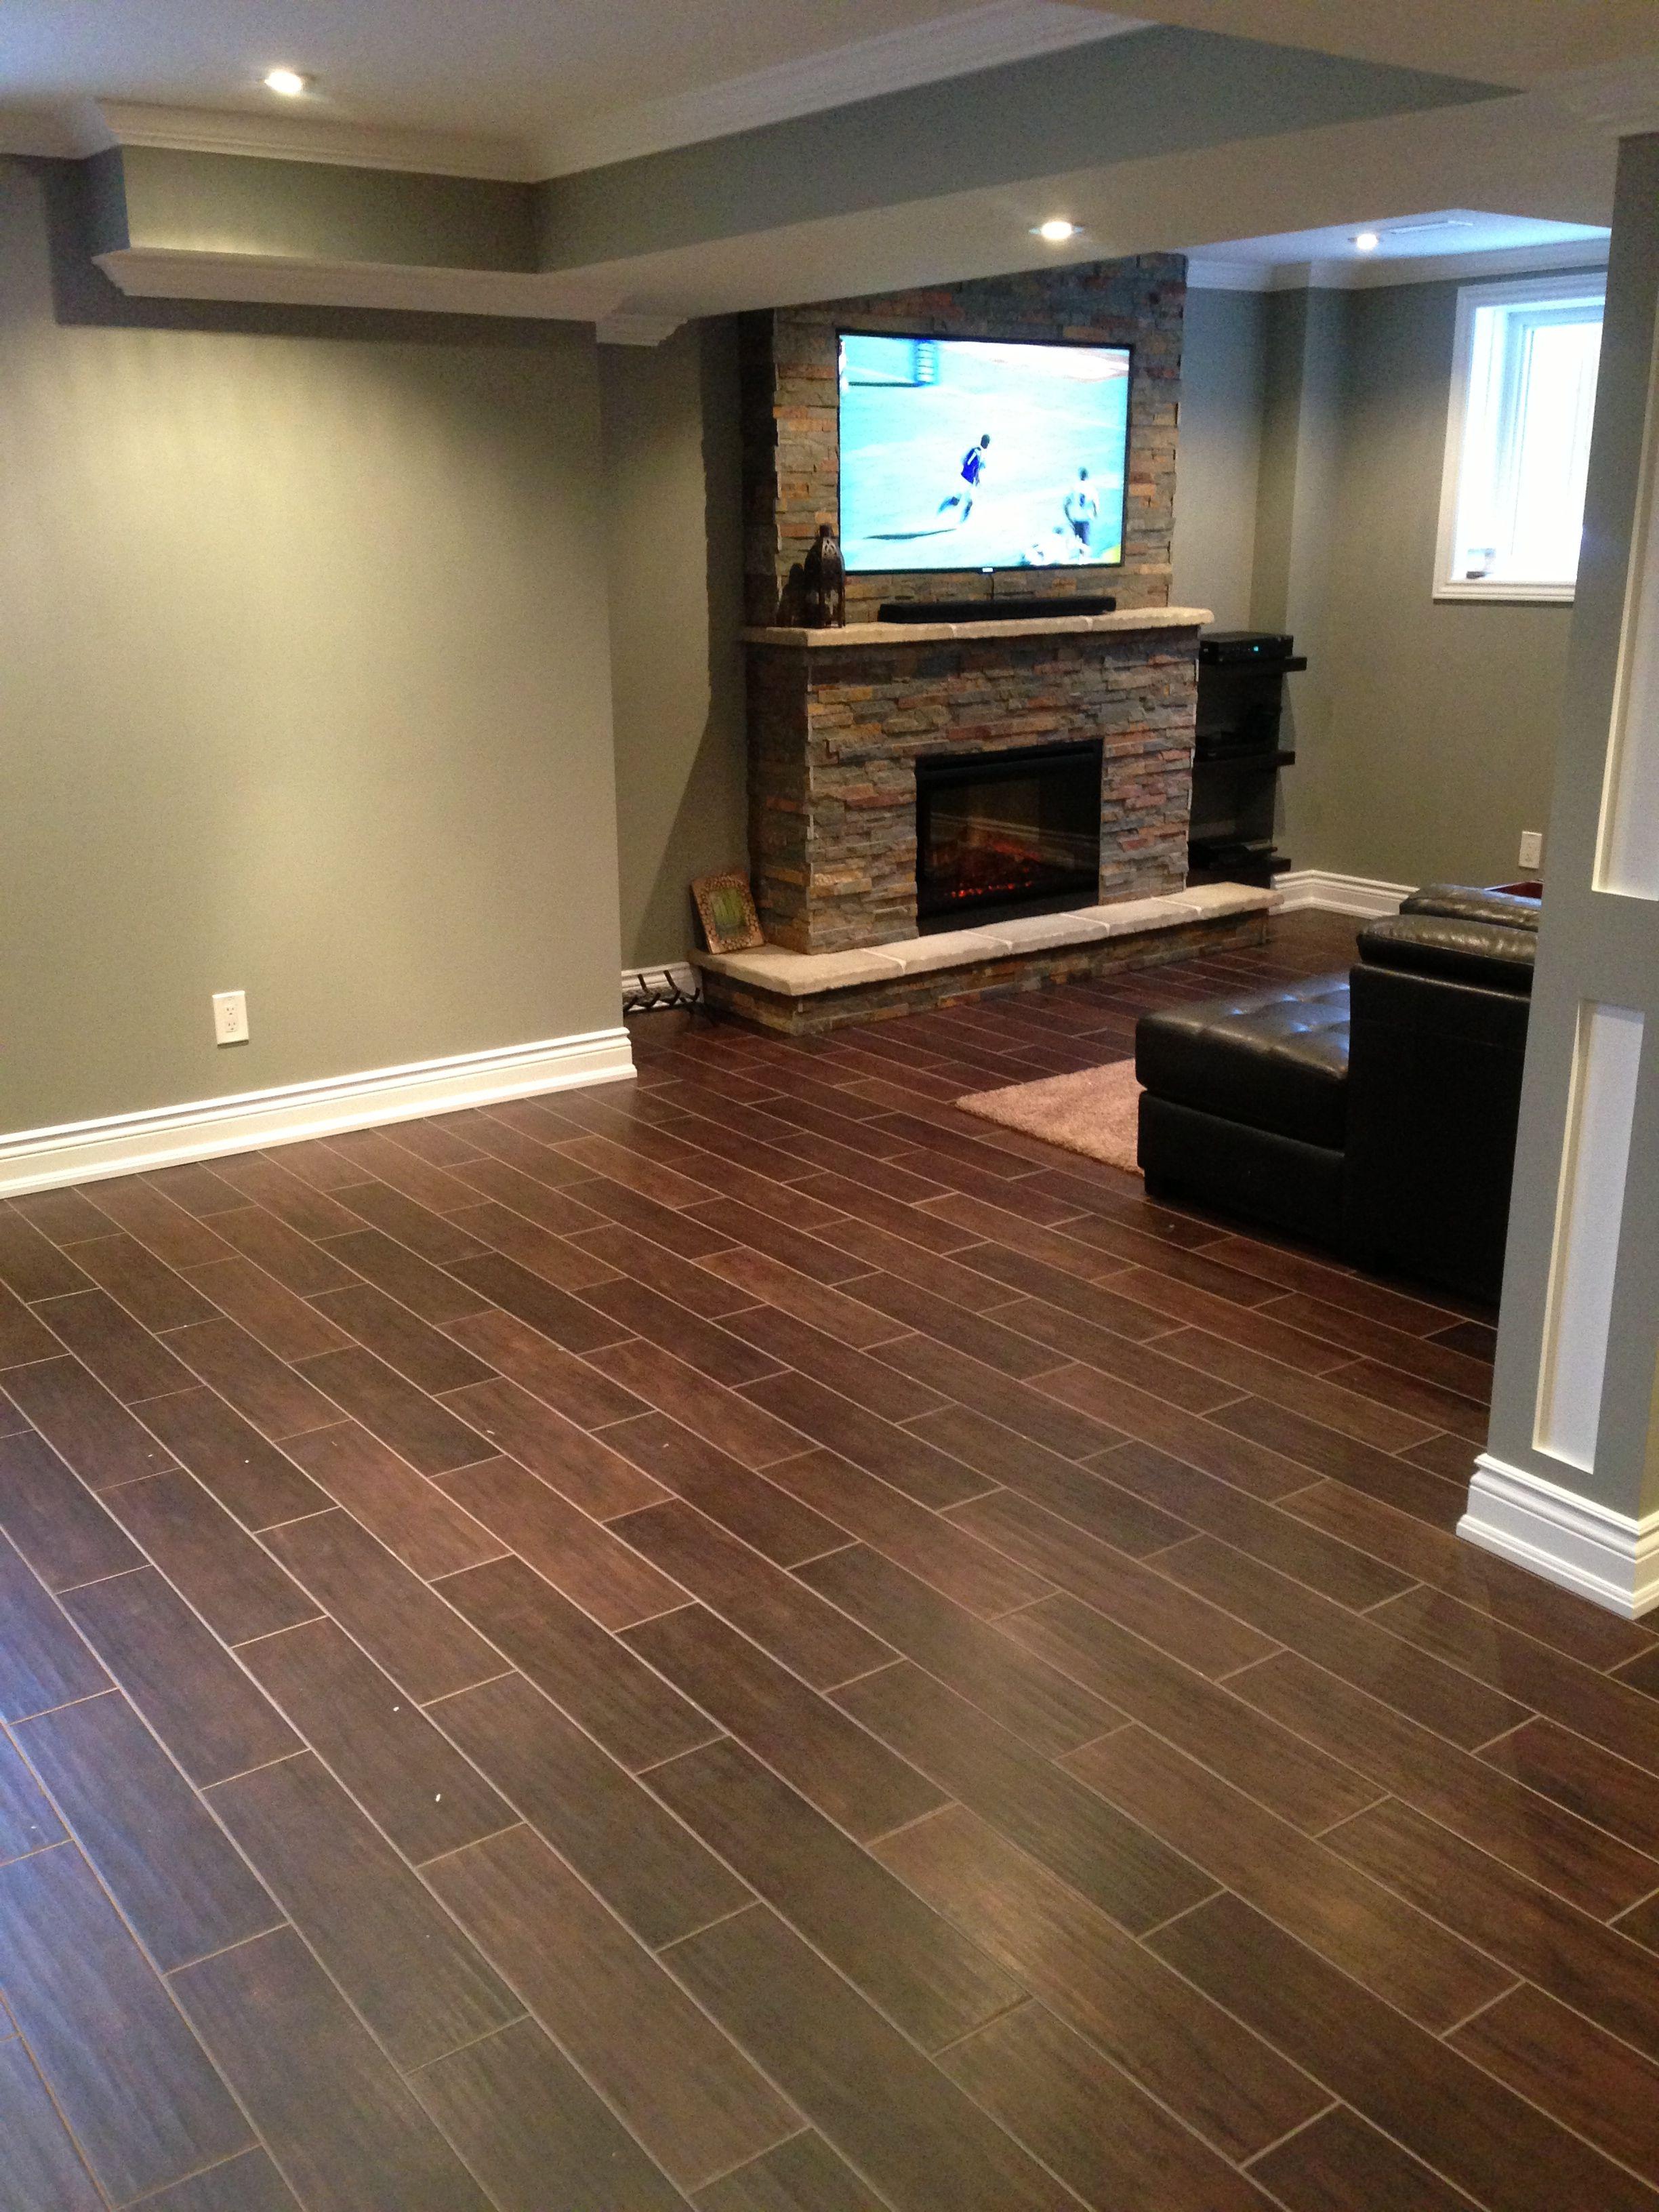 Hardwood floor alternative hardwood styled tile dark for Wood floor alternatives